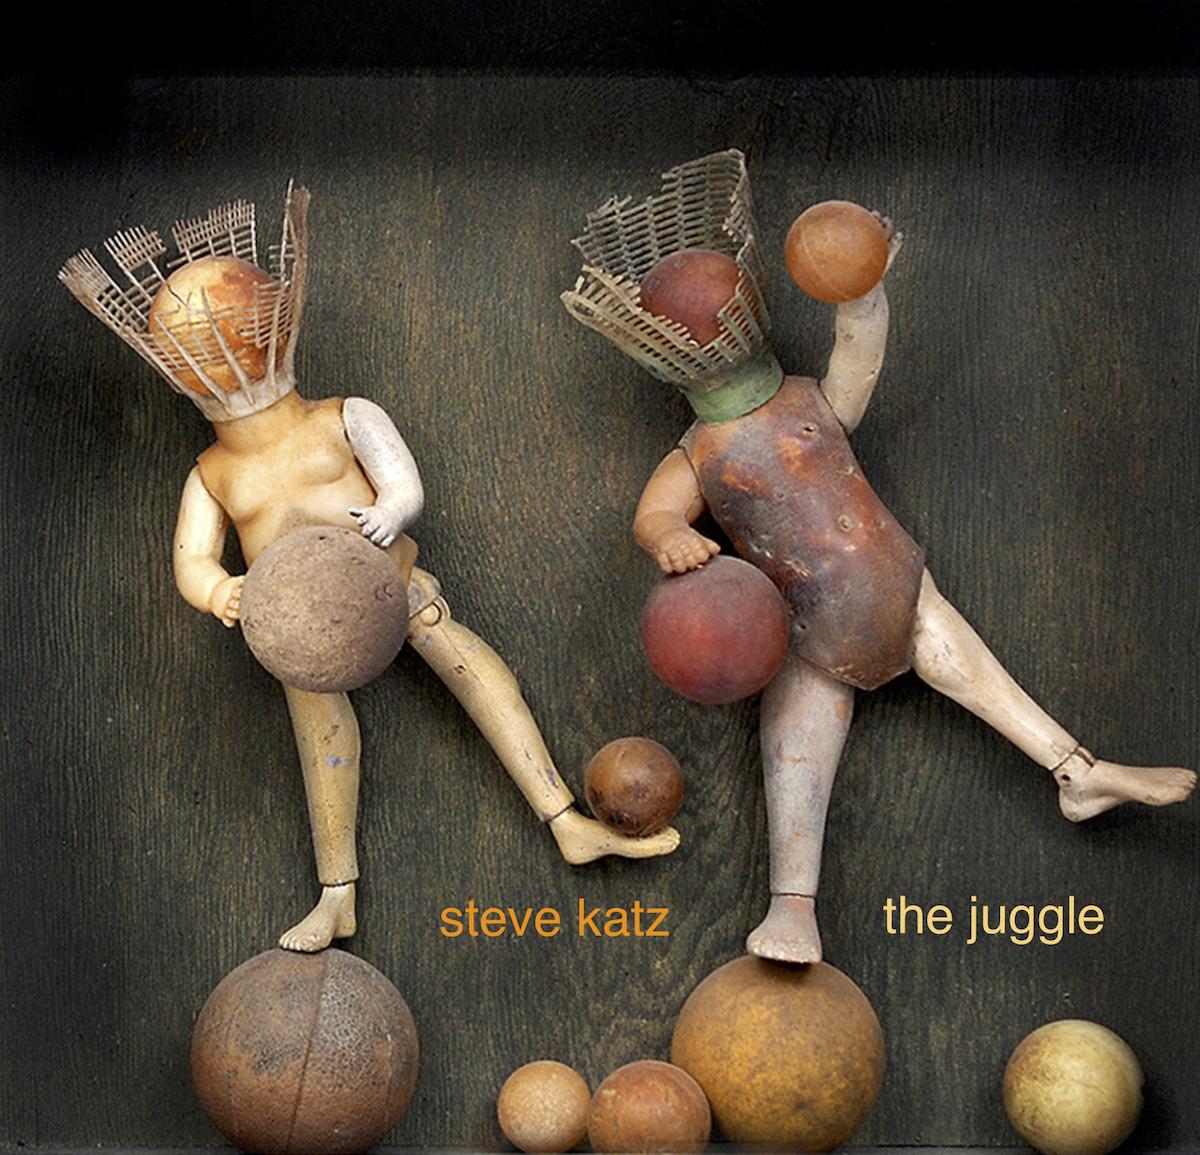 the juggle copy.jpg